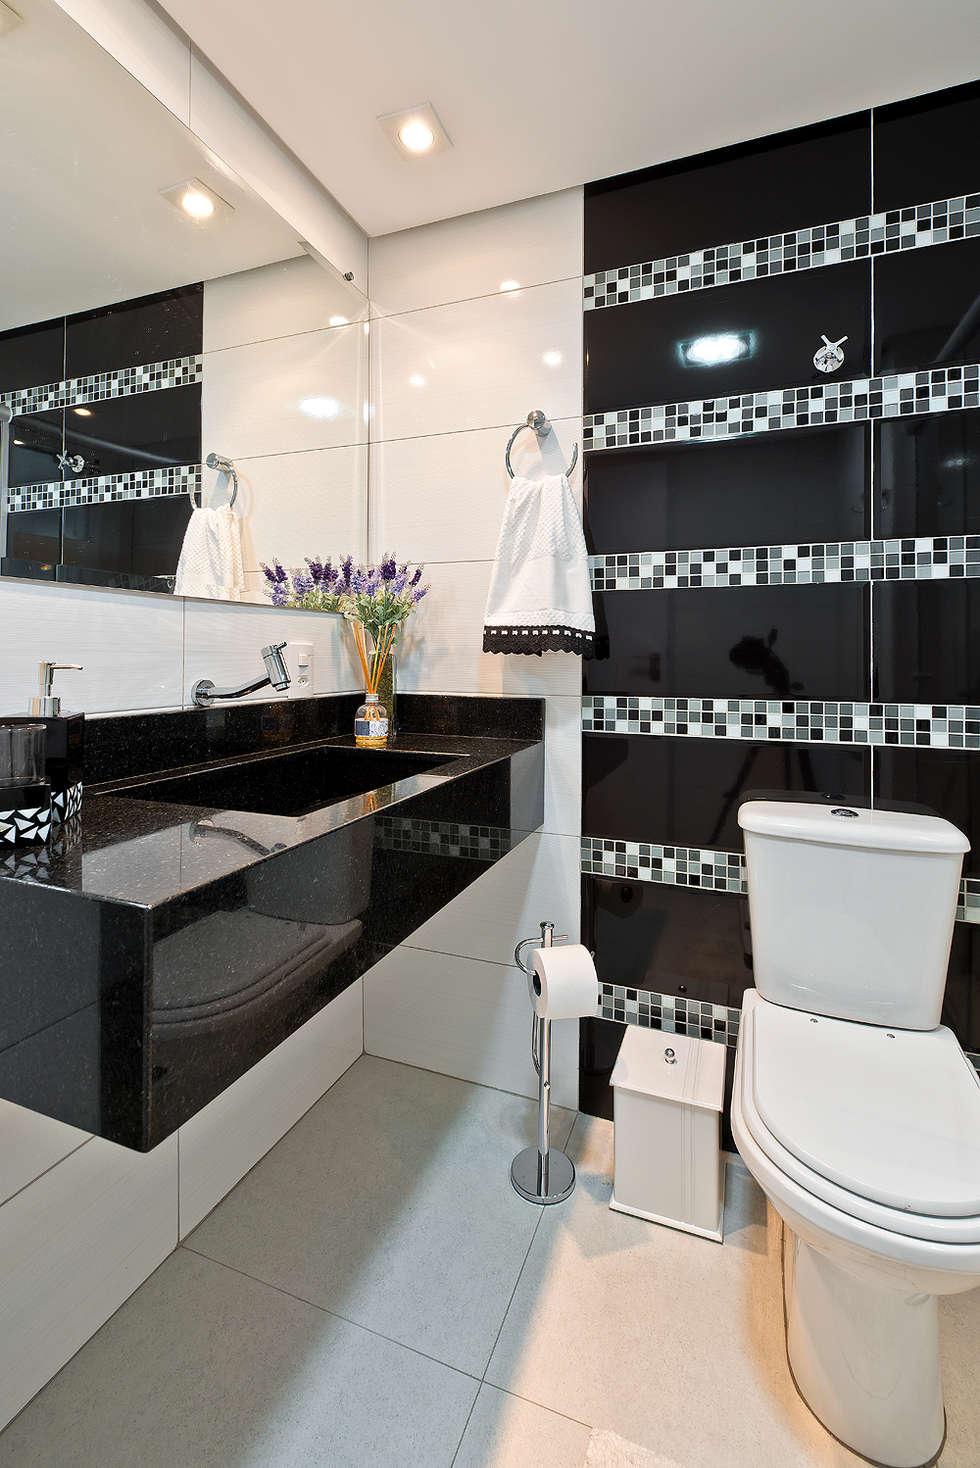 Banheiro: Banheiros modernos por Patricia Vertuan